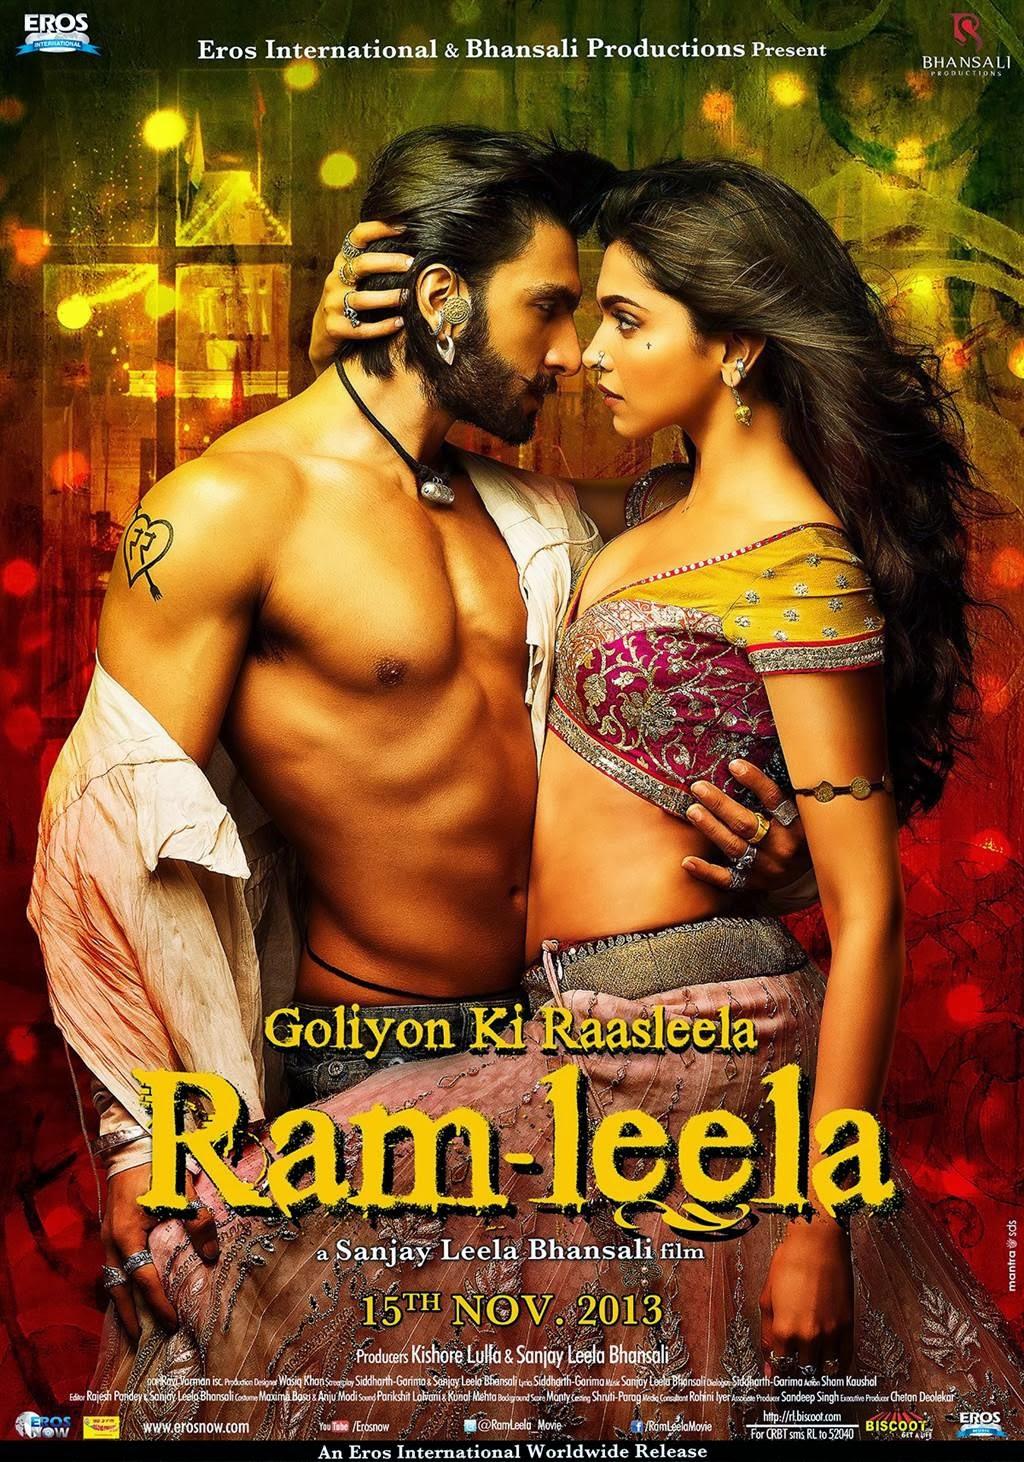 Watch Ram Leela (2013) Hindi DVDScr Full Movie Watch Online For Free Download